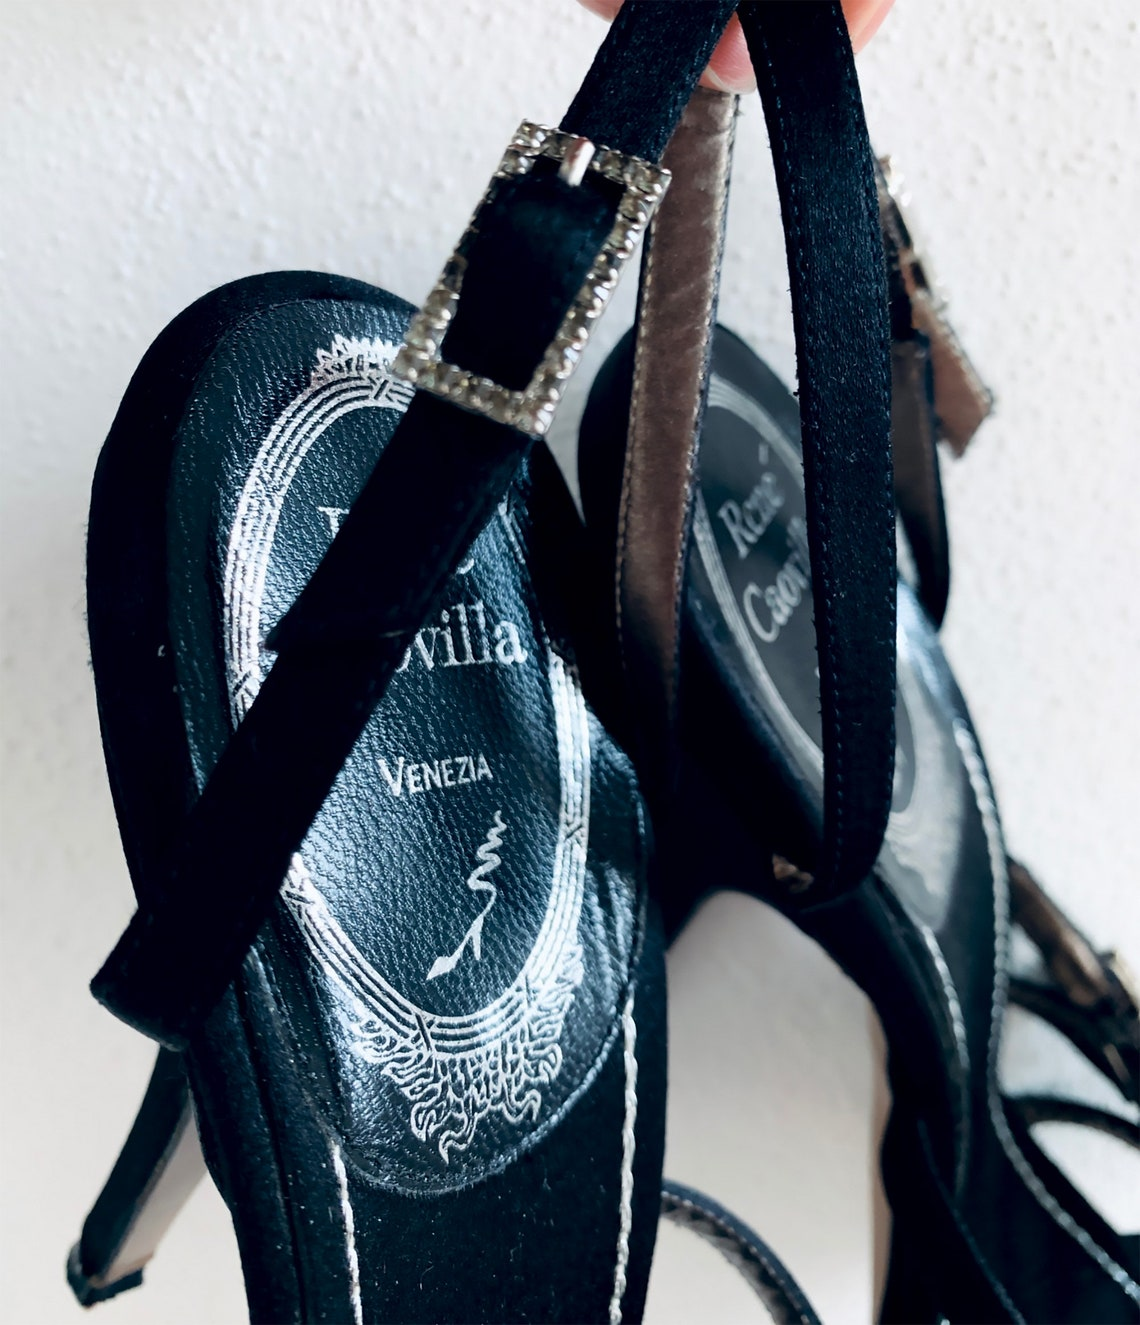 Renᄄᄄ Caovilla Original Evening Sandals Jeweled Black Satin - Big Sale tpun4